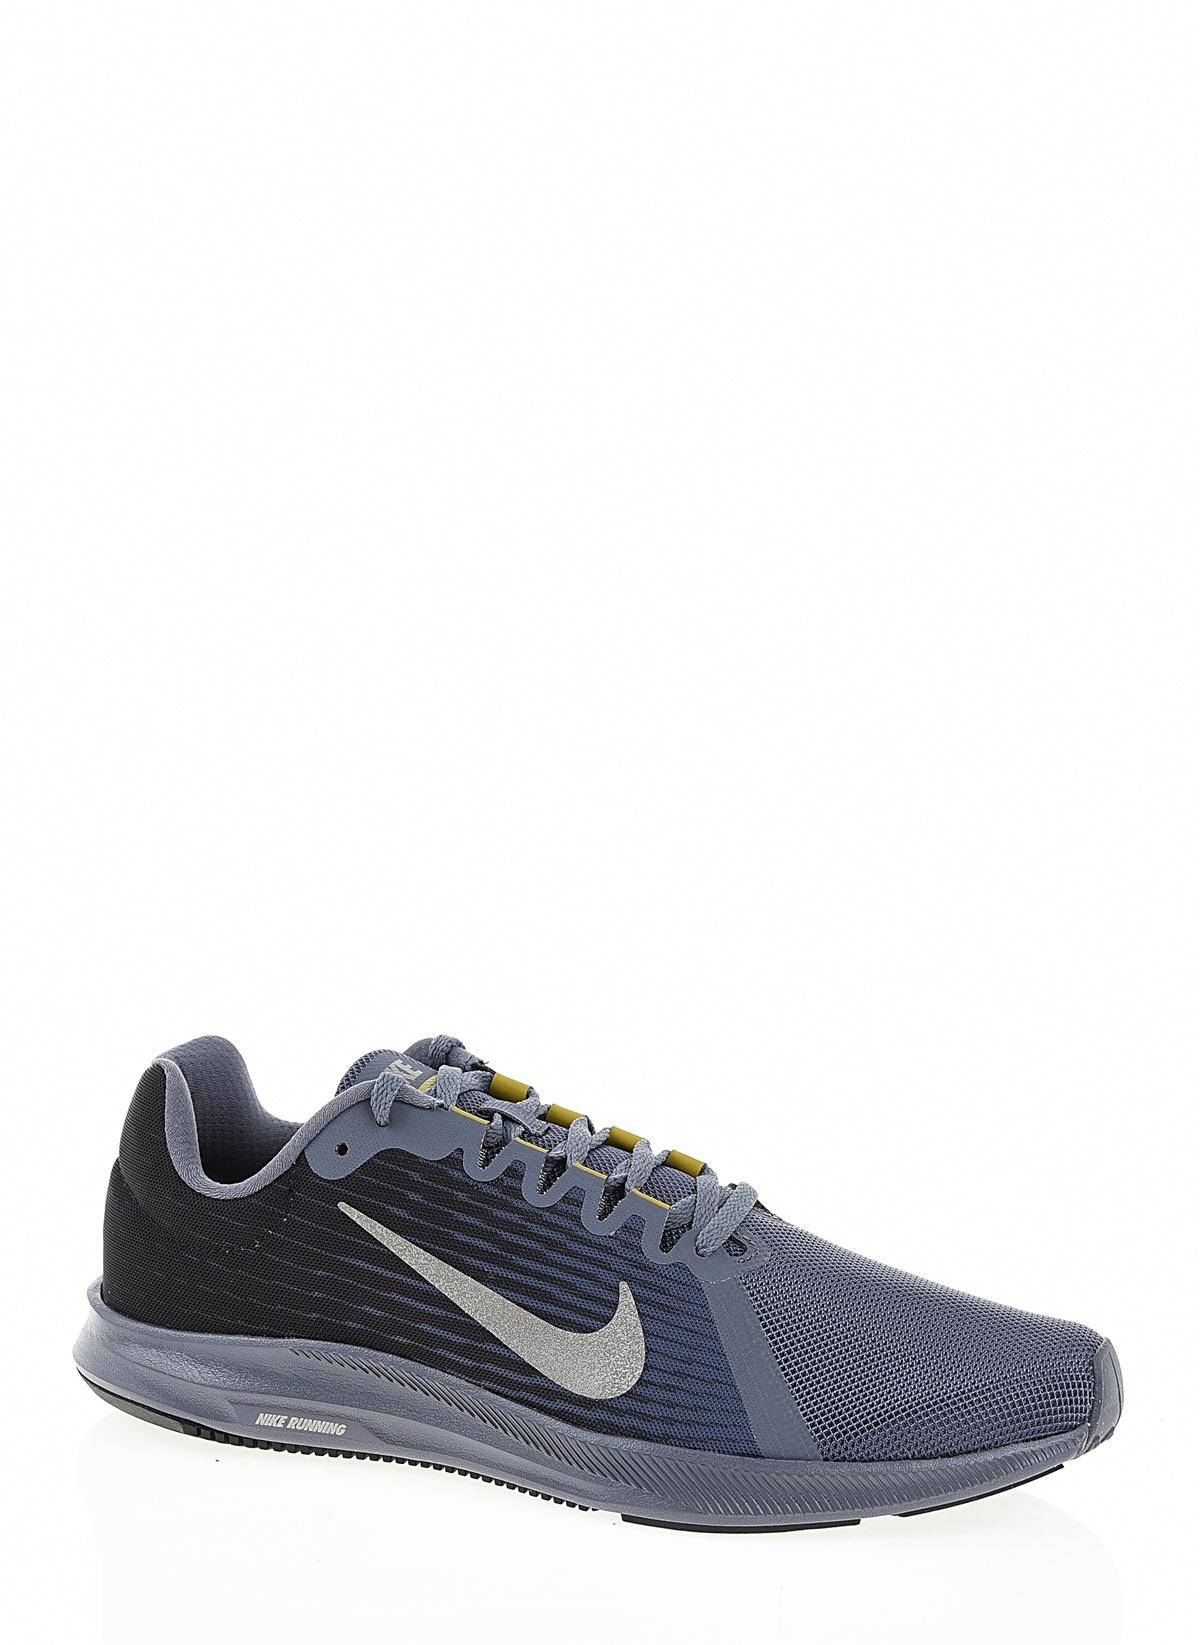 recognized brands store discount shop 908984-011 Nike Downshifter 8,Light Carbon/Mtlc Pe